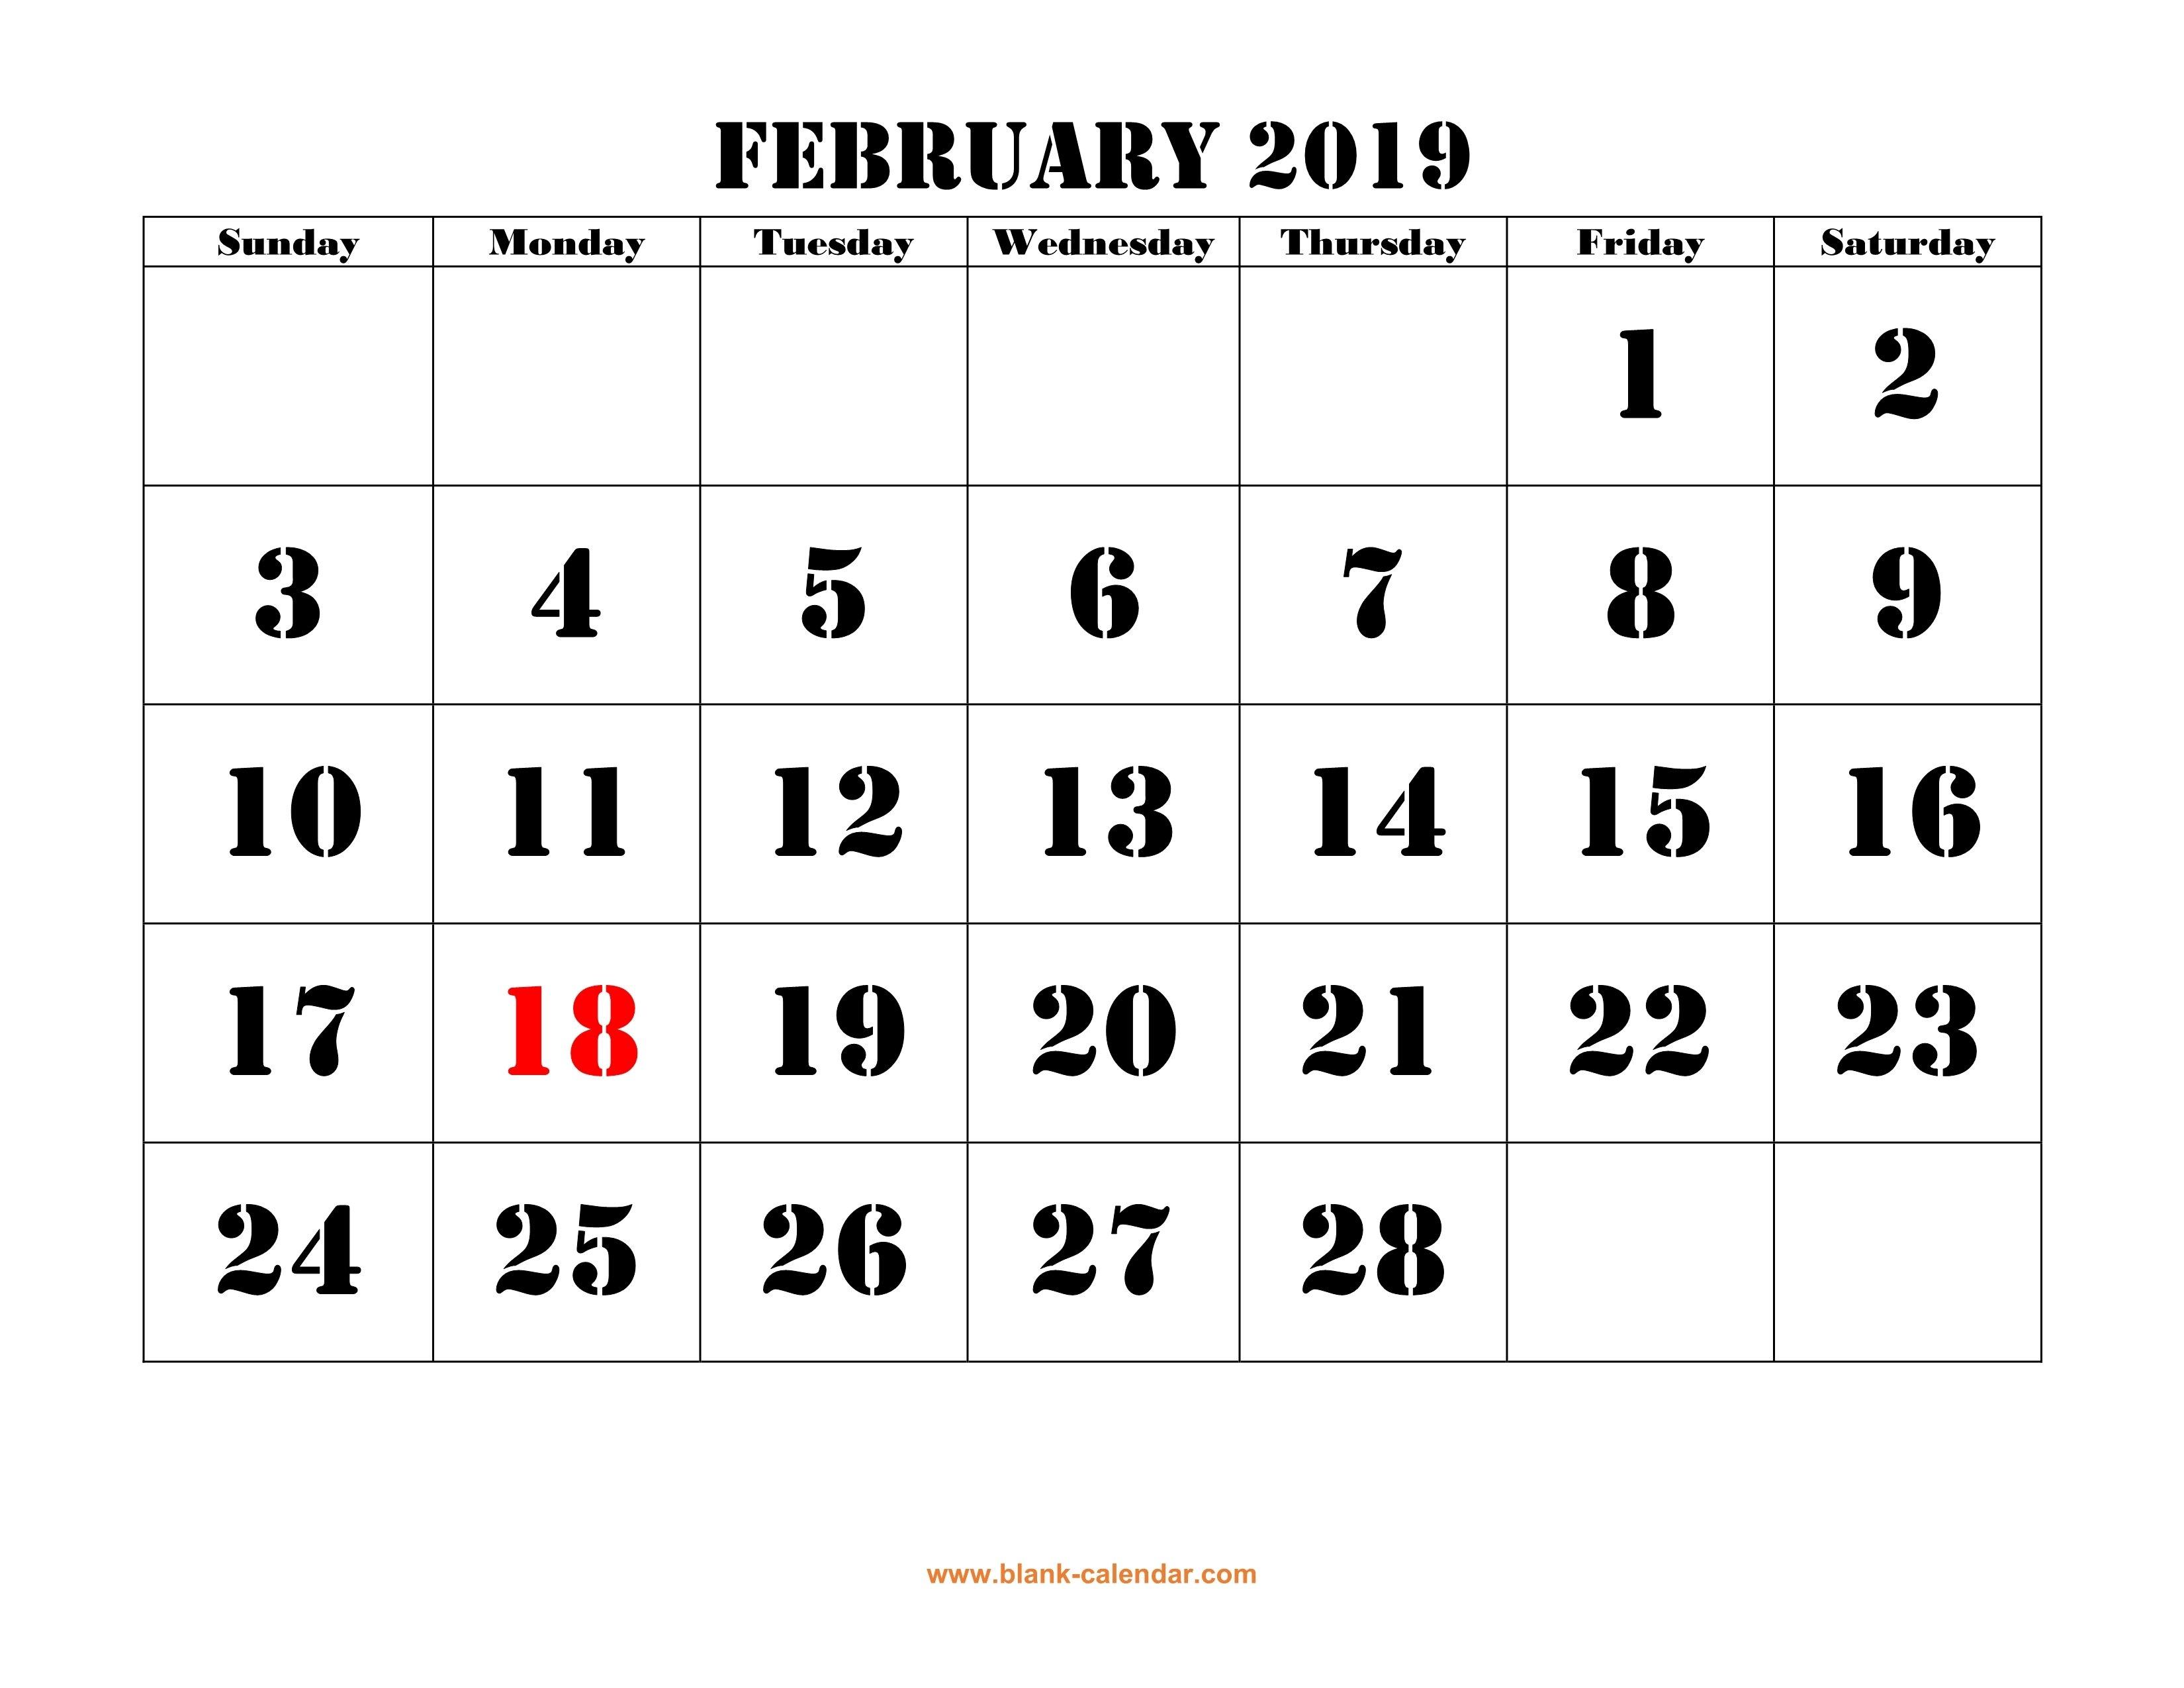 Free Download Printable February 2019 Calendar, Large Font Design Feb 6 2019 Calendar